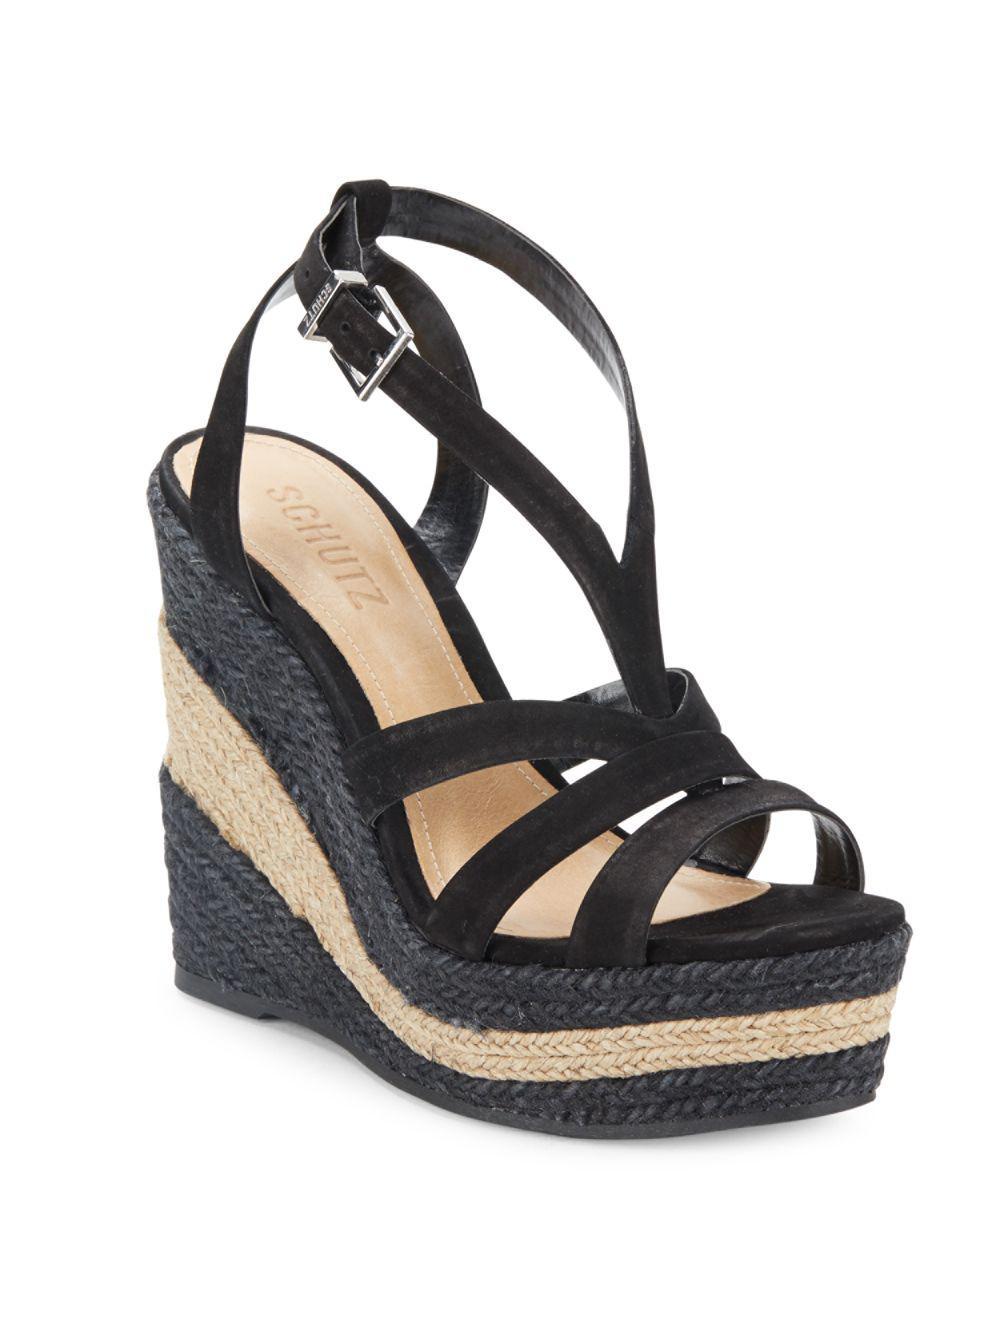 0ffa1dfecc3 Lyst - Schutz Daenerys Strappy Wedge Platform Sandals in Black